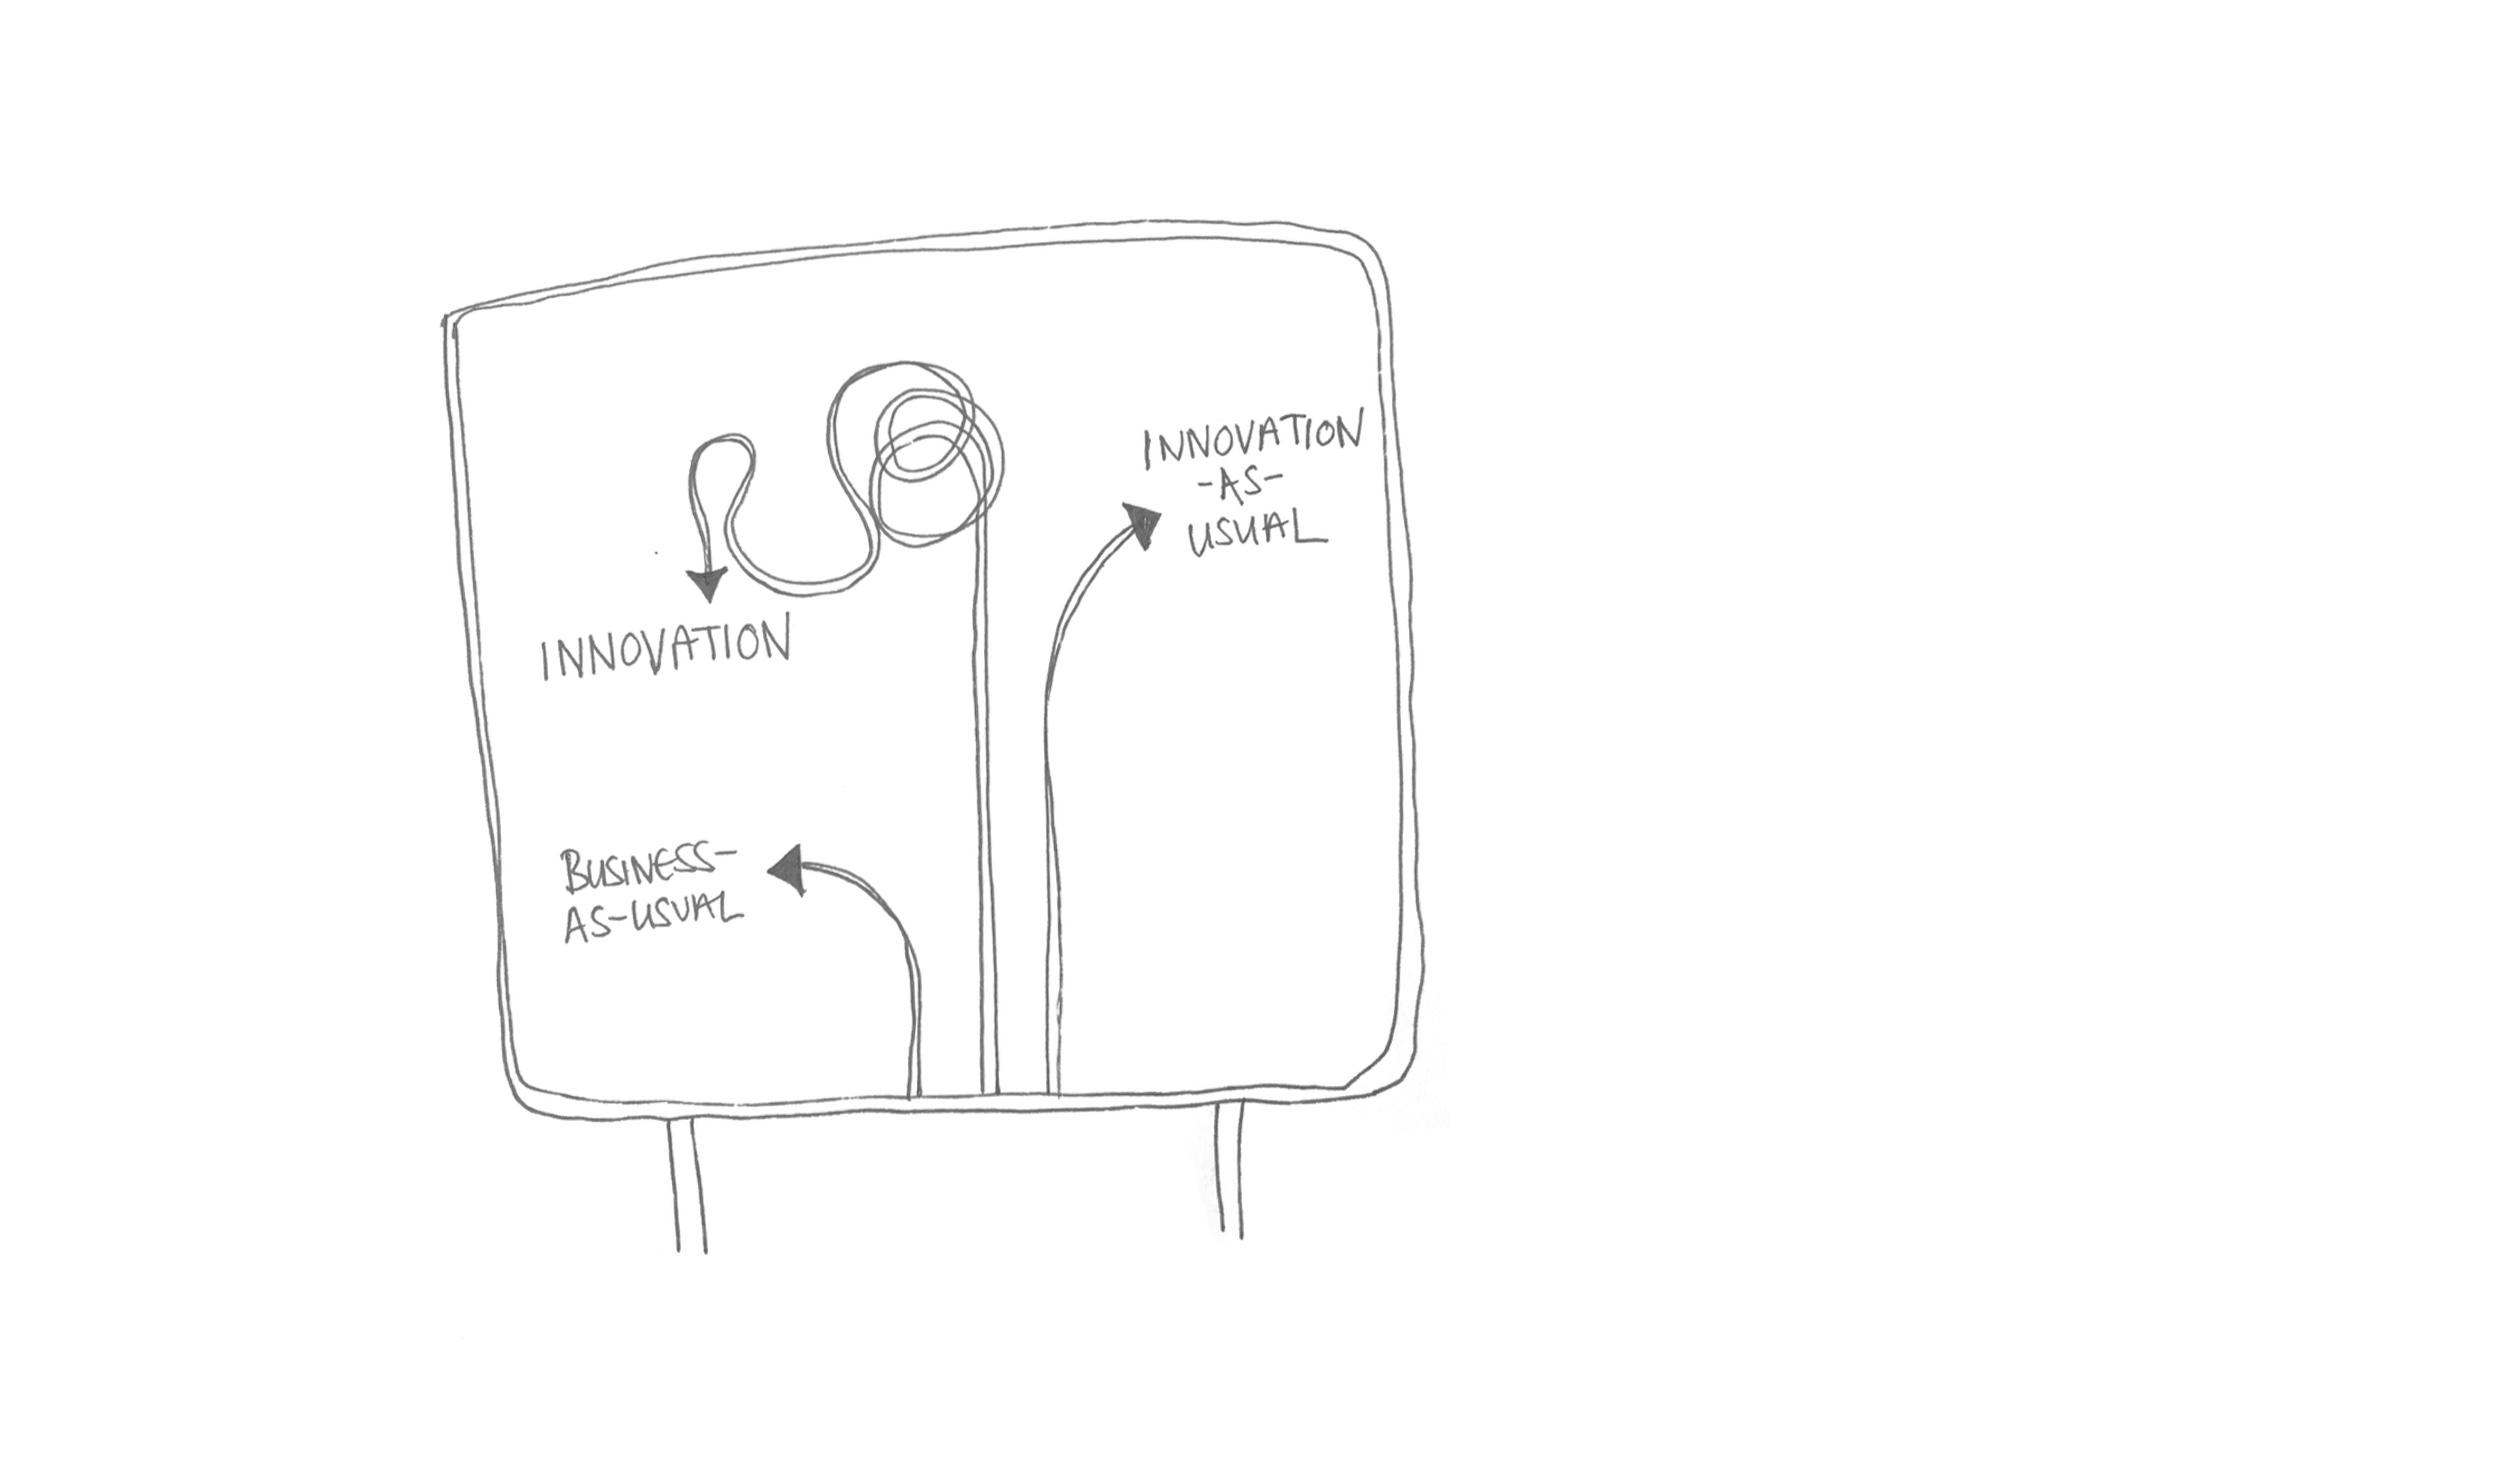 innovation-as-usual-rebel-futures-blog.jpg